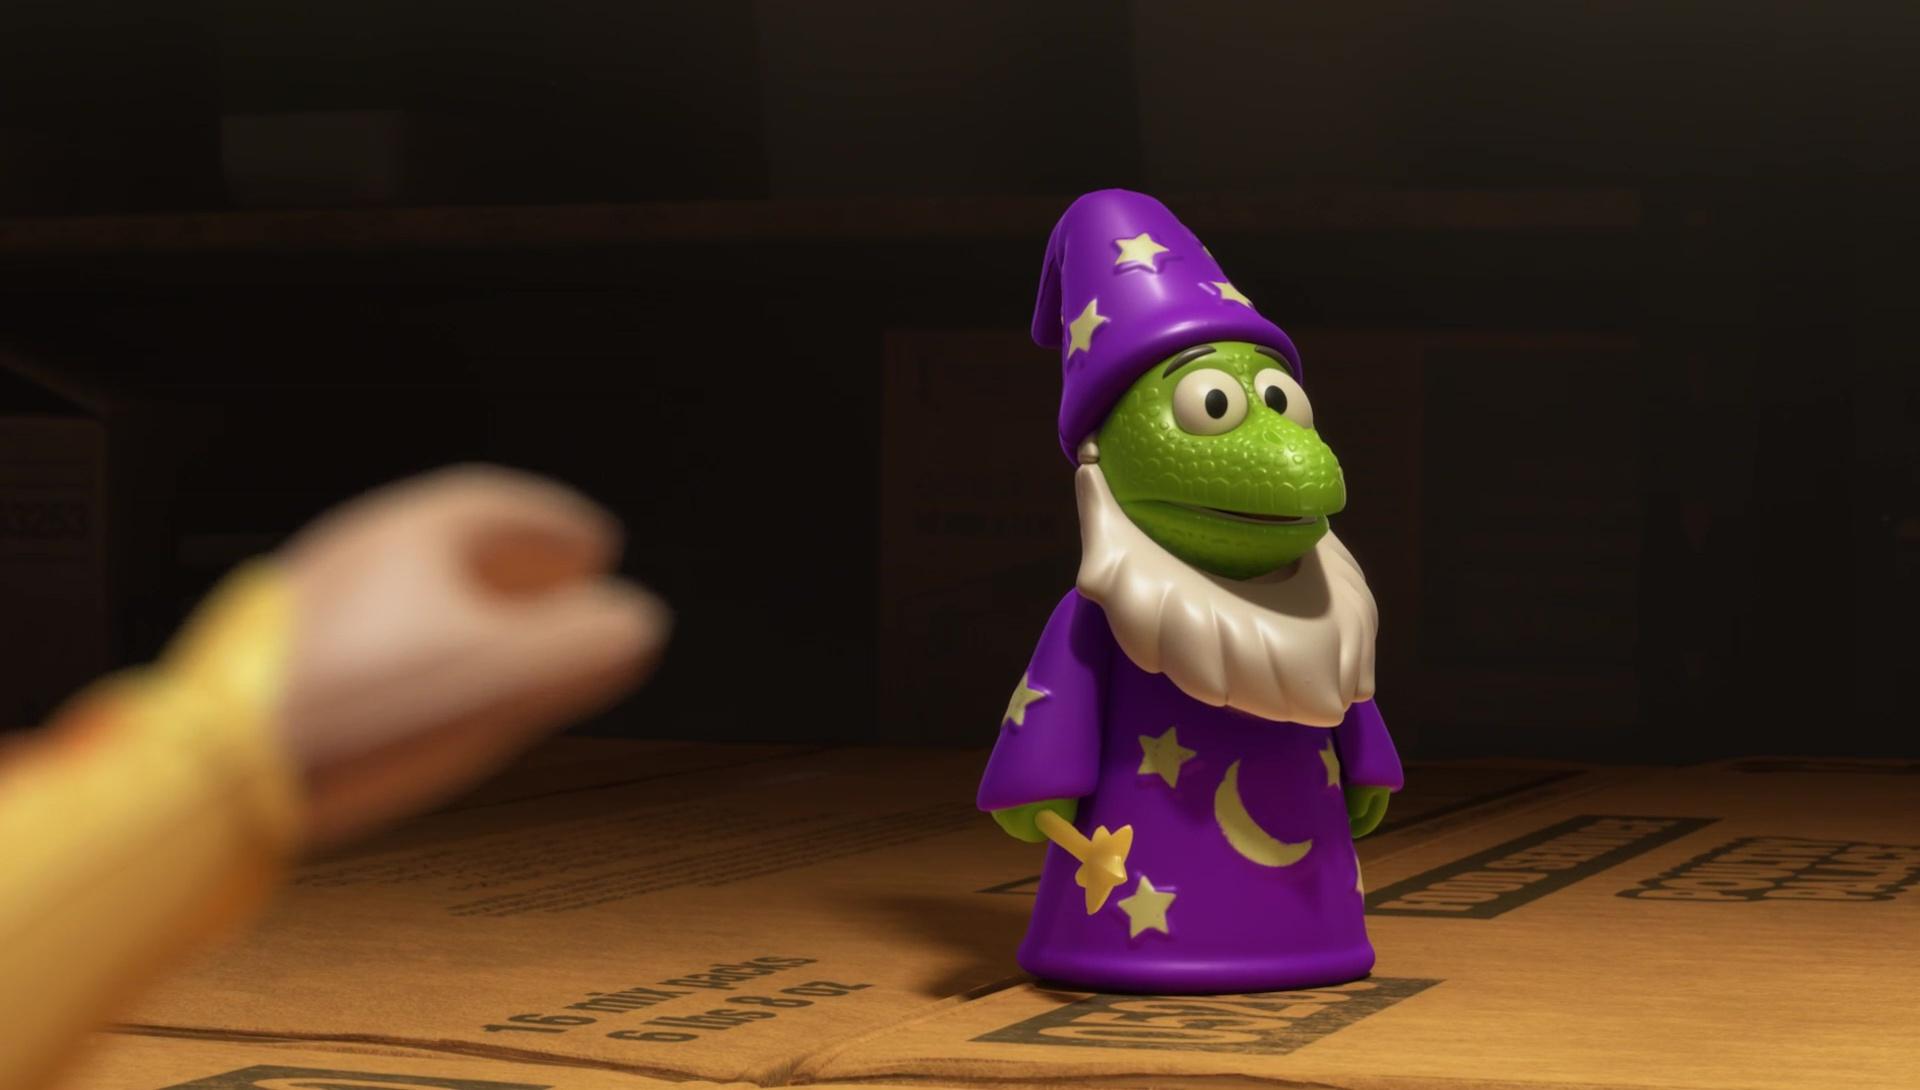 lezard-enchanteur-personnage-toy-story-mini-buzz-01